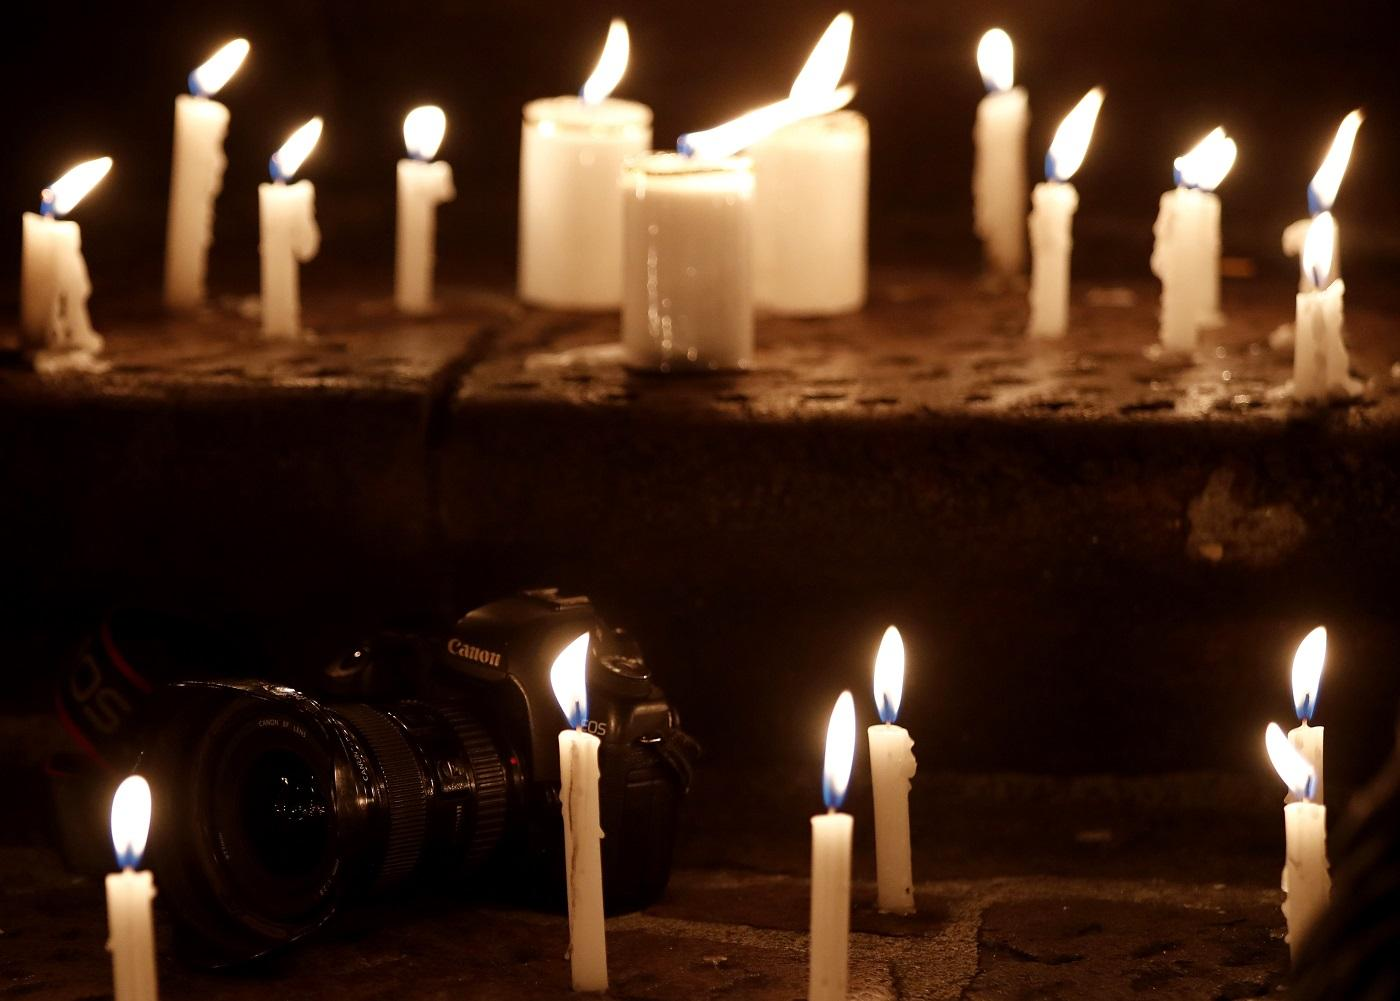 ONU dice asesinato de ecuatorianos tiene efecto grave en libertad de prensa